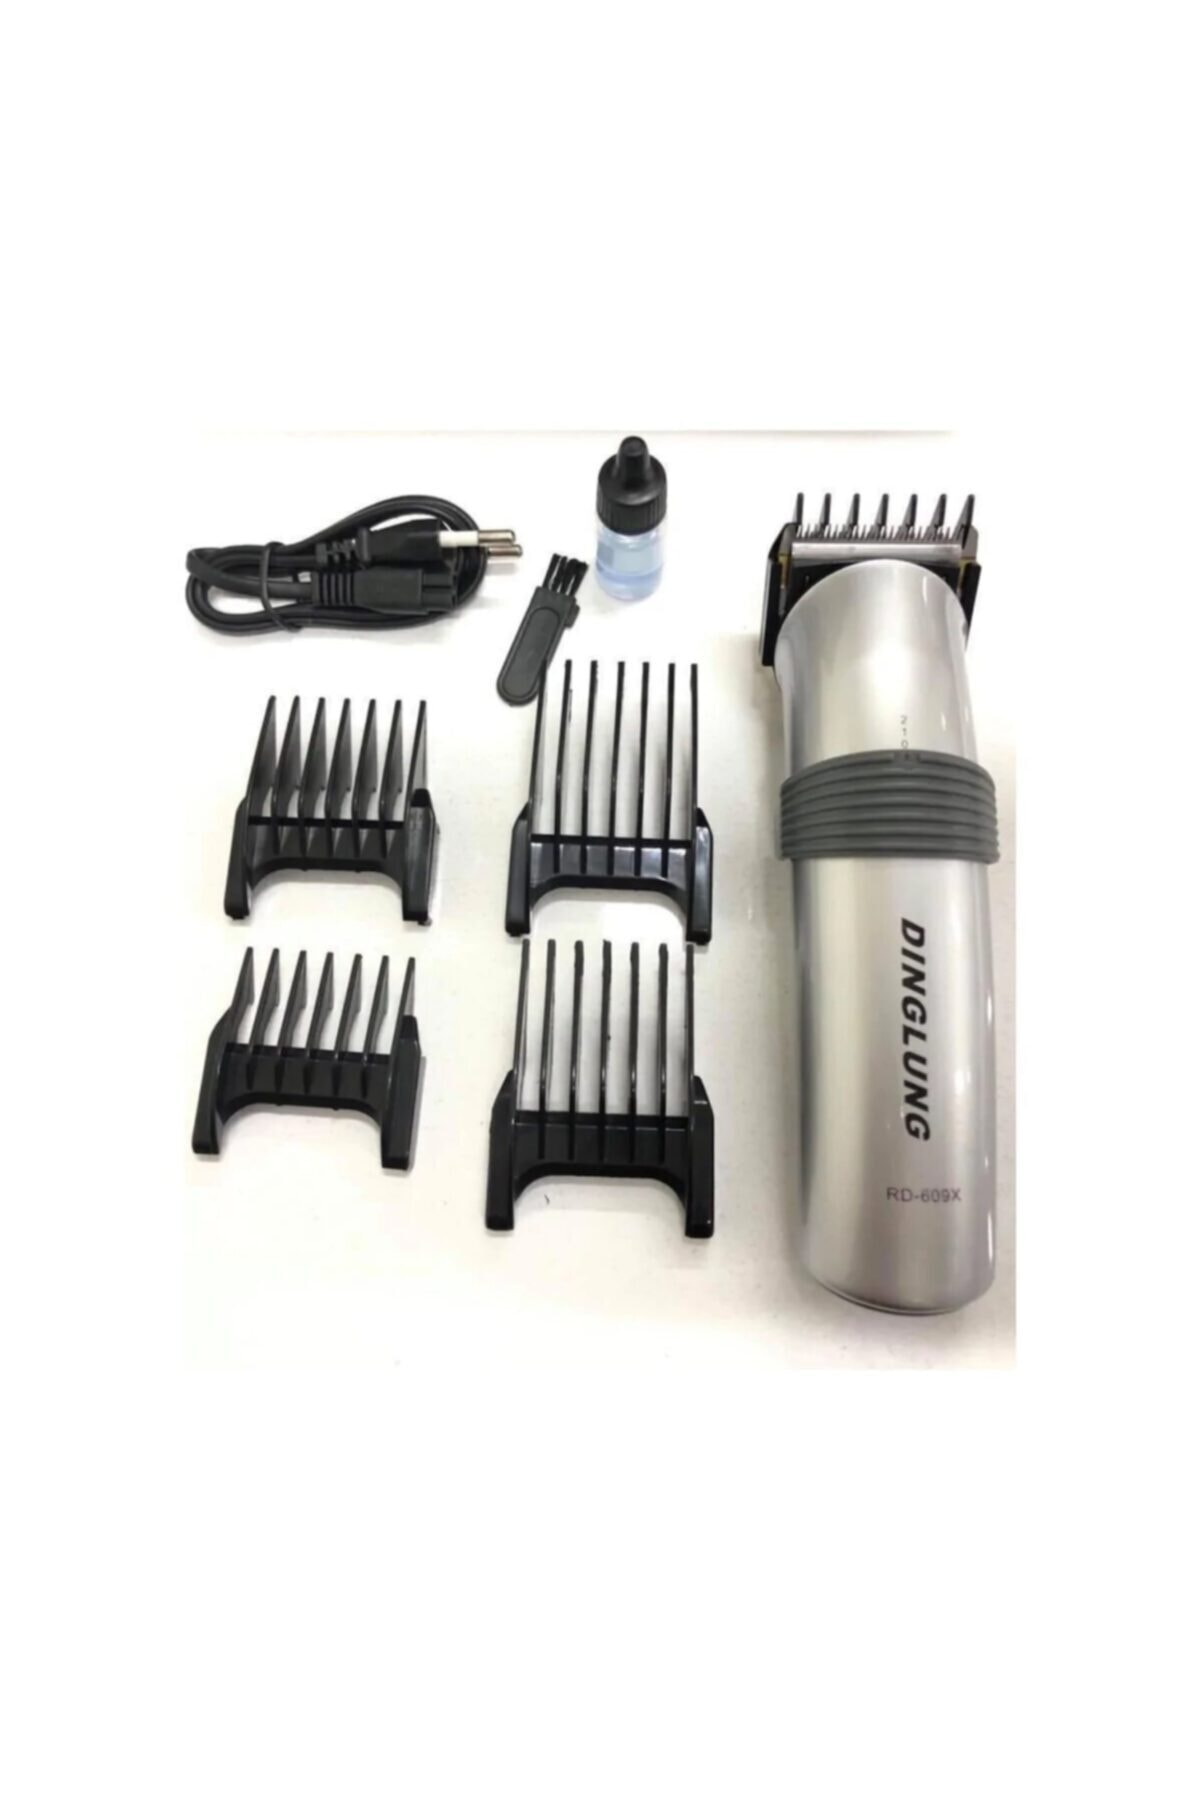 KUSTAR Berber Kuaför Kablosuz Traş Tıraş Seti Saç Sakal Tıraş Makinesi Şarjlı Kablosuz 2